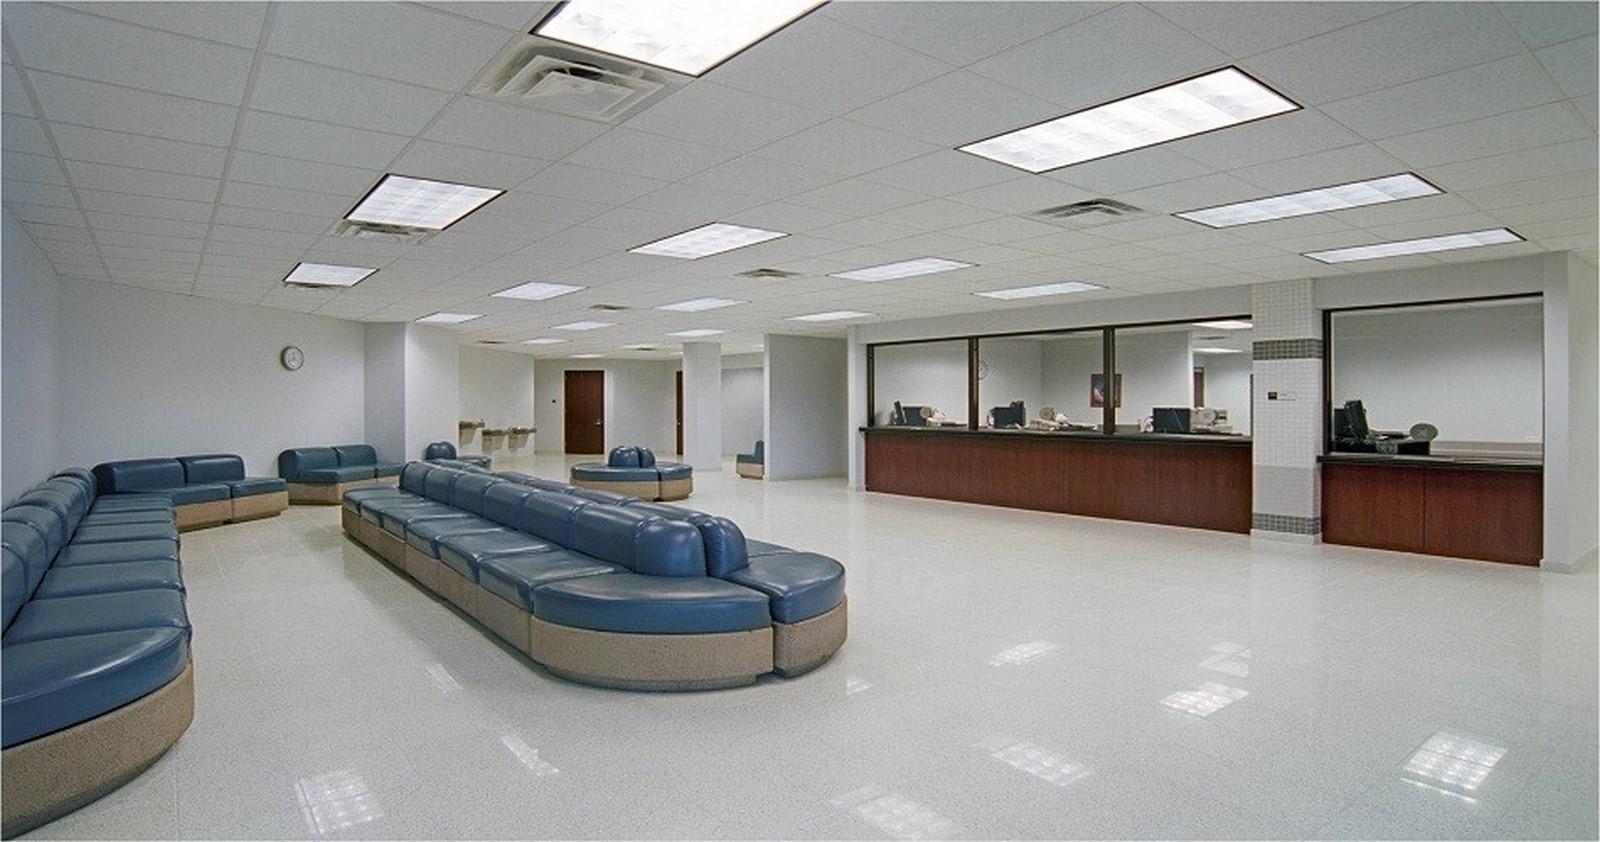 City of Houston – Westside Command Center - Sheet3